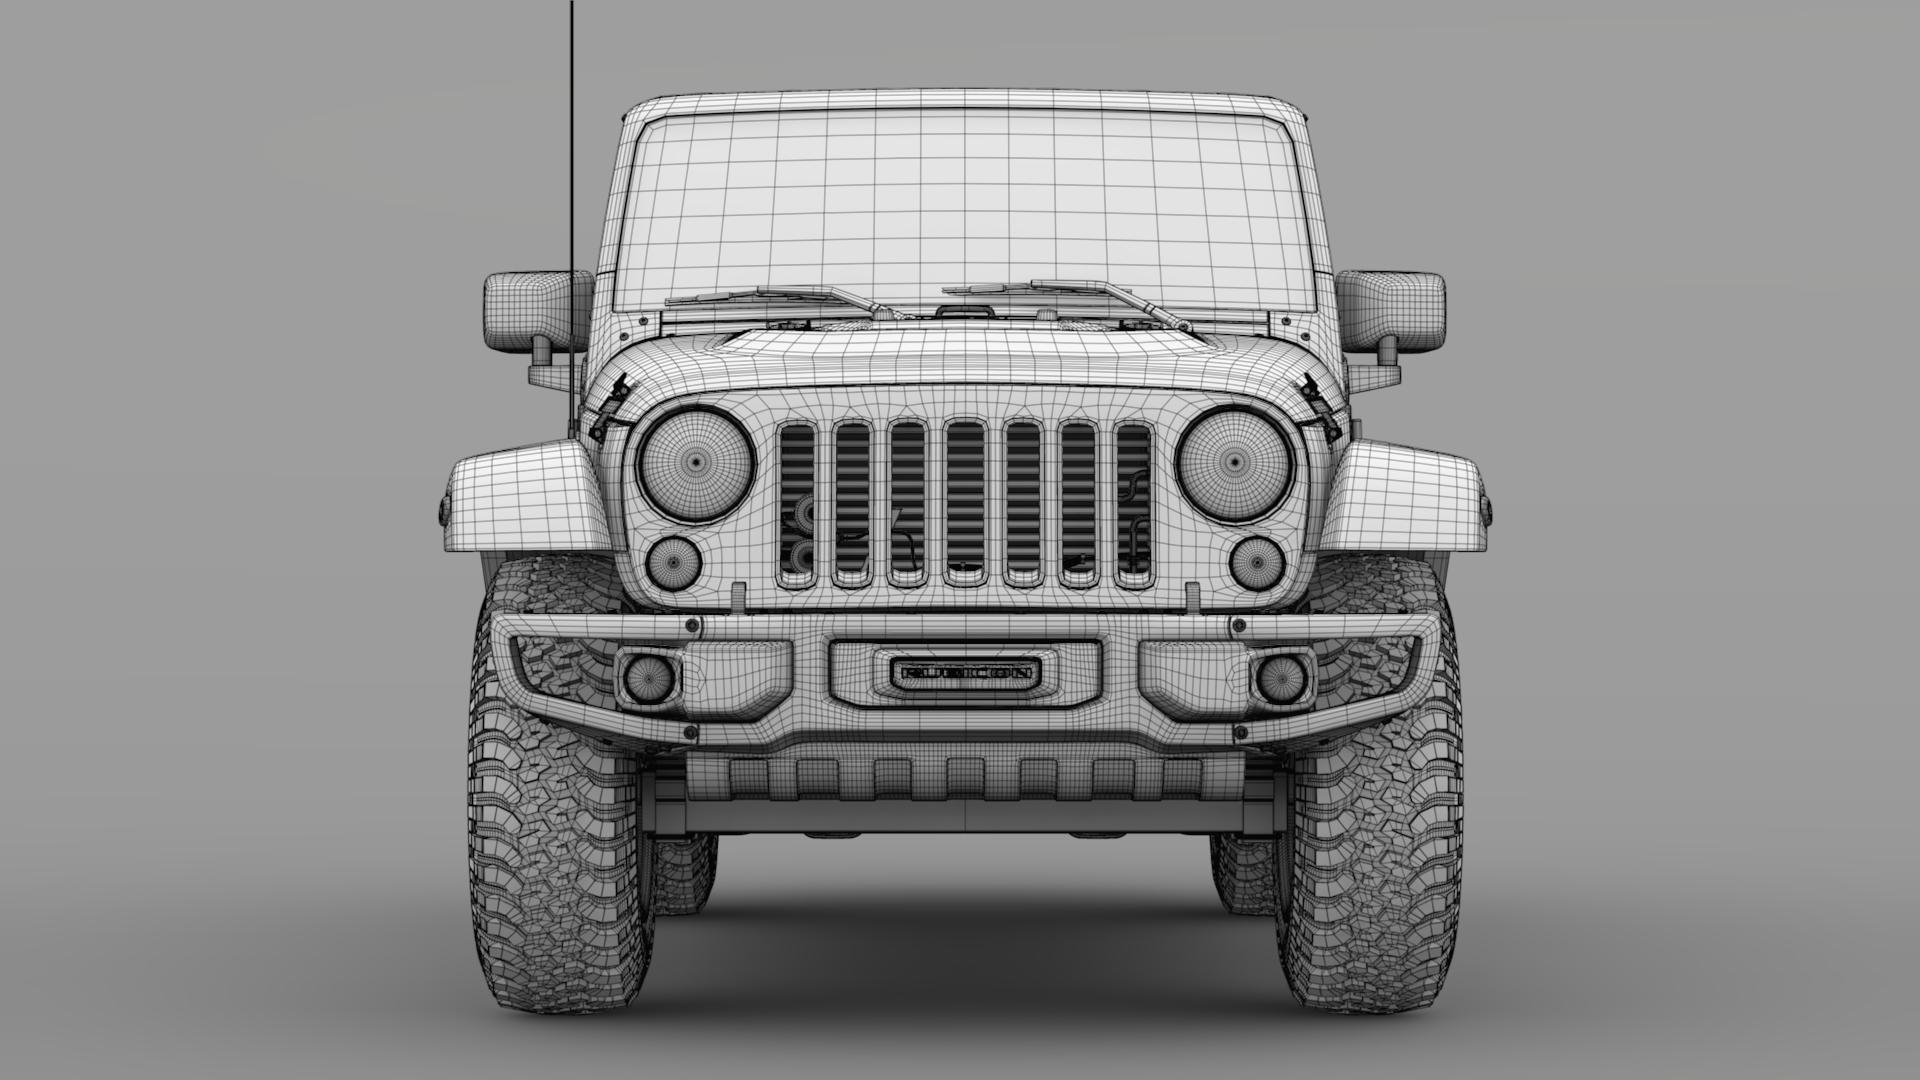 jeep wrangler rubicon recon jk 2017 3d model max fbx lwo ma mb hrc xsi obj 276952